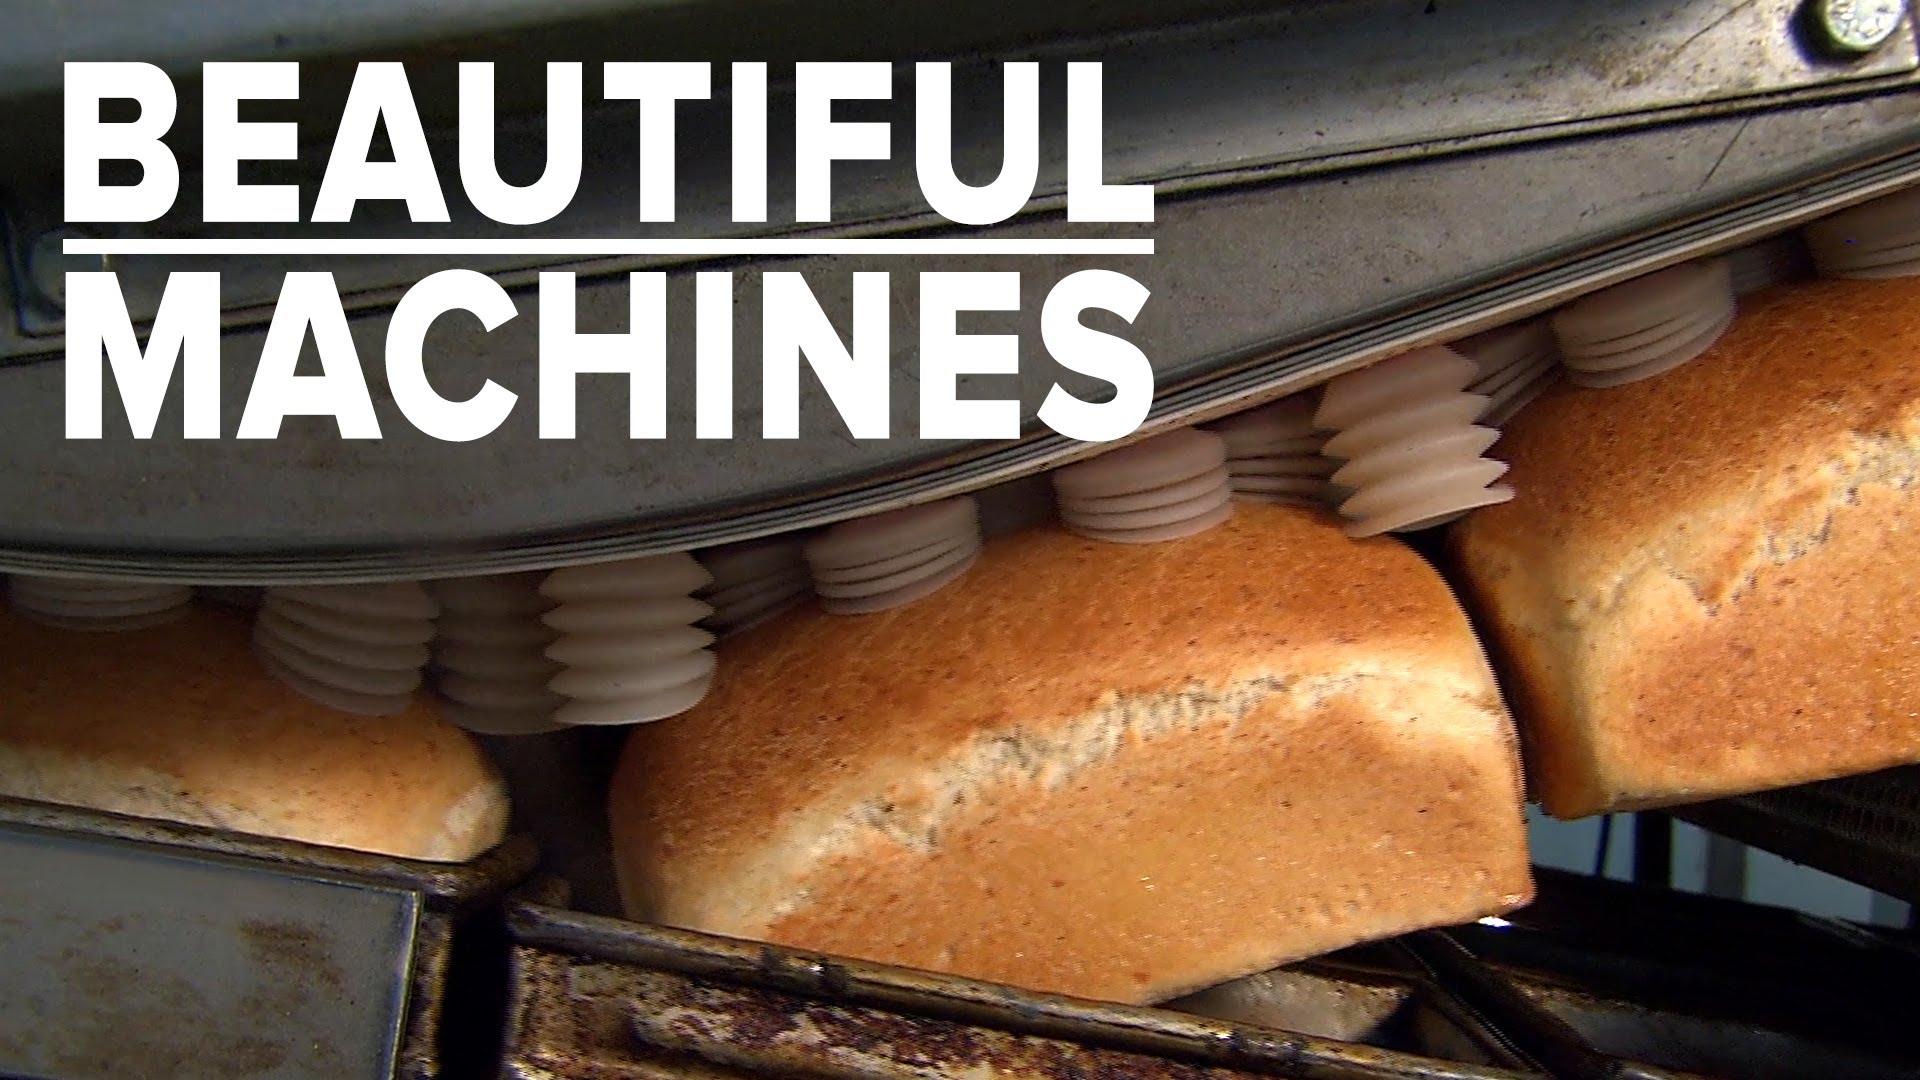 Des jolies machines